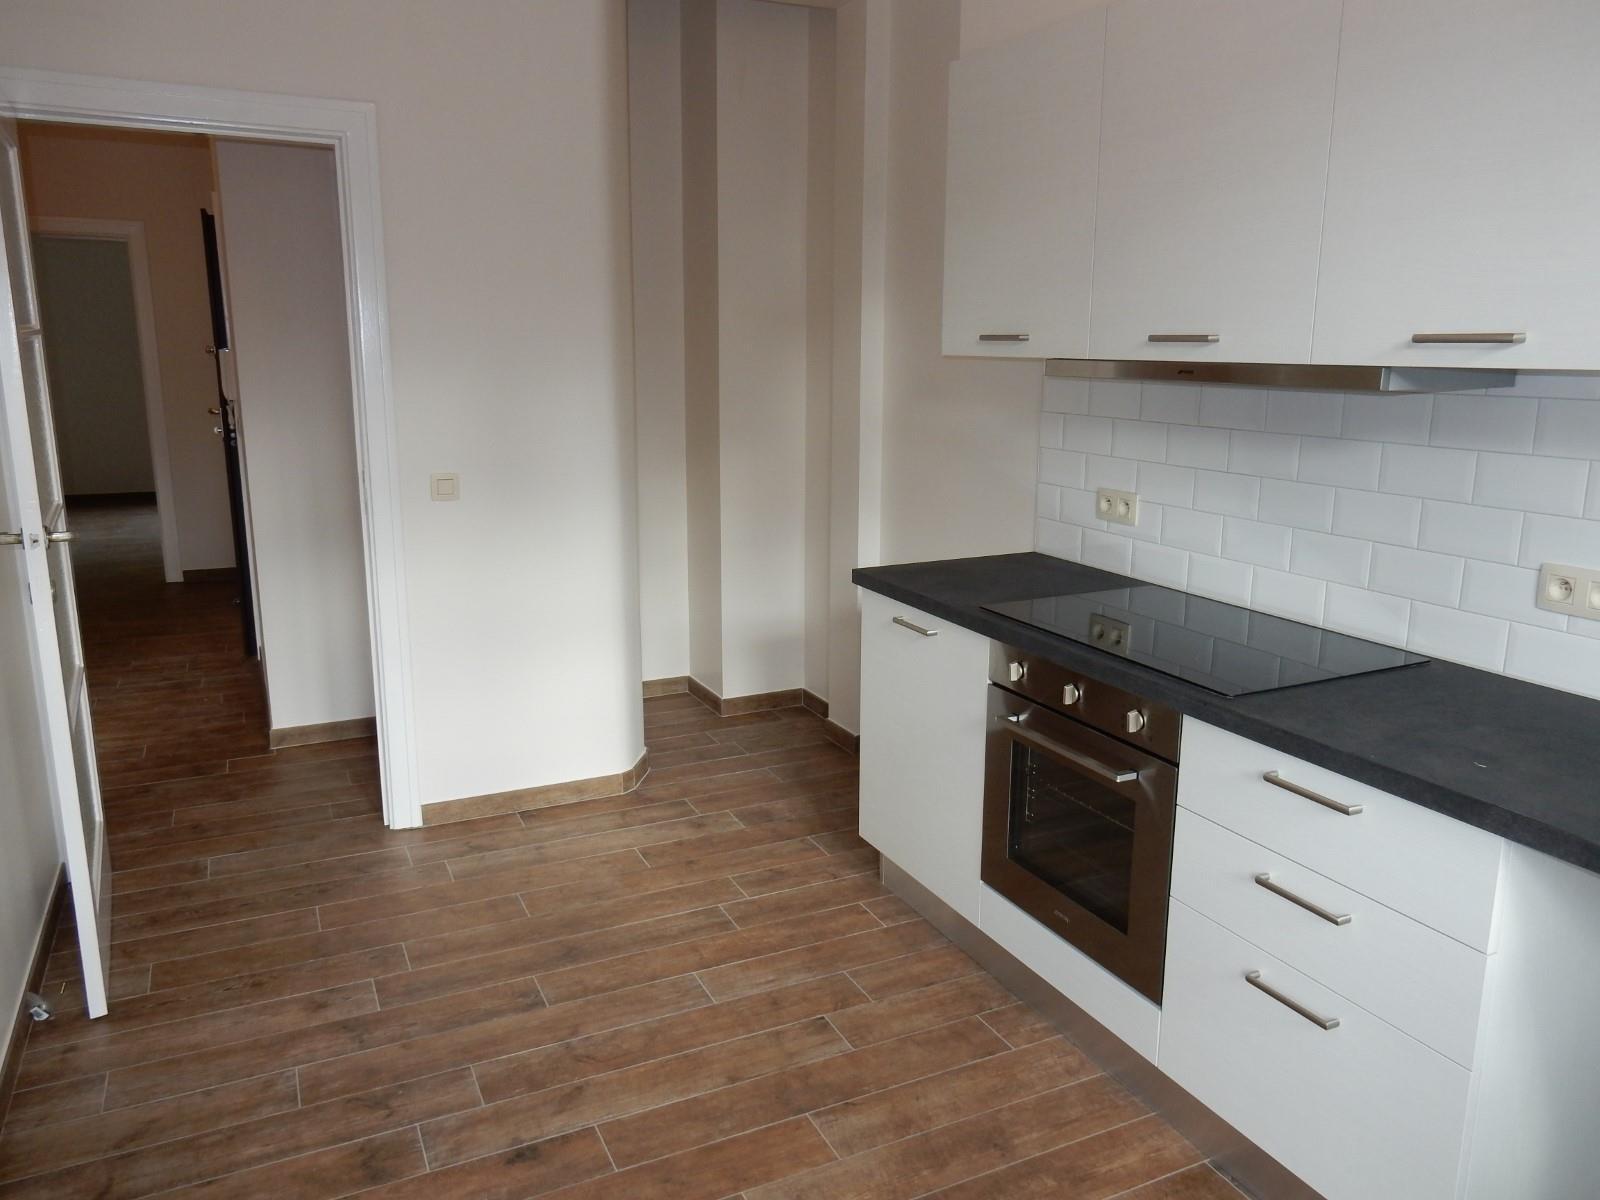 Appartement - Molenbeek-Saint-Jean - #3532282-4